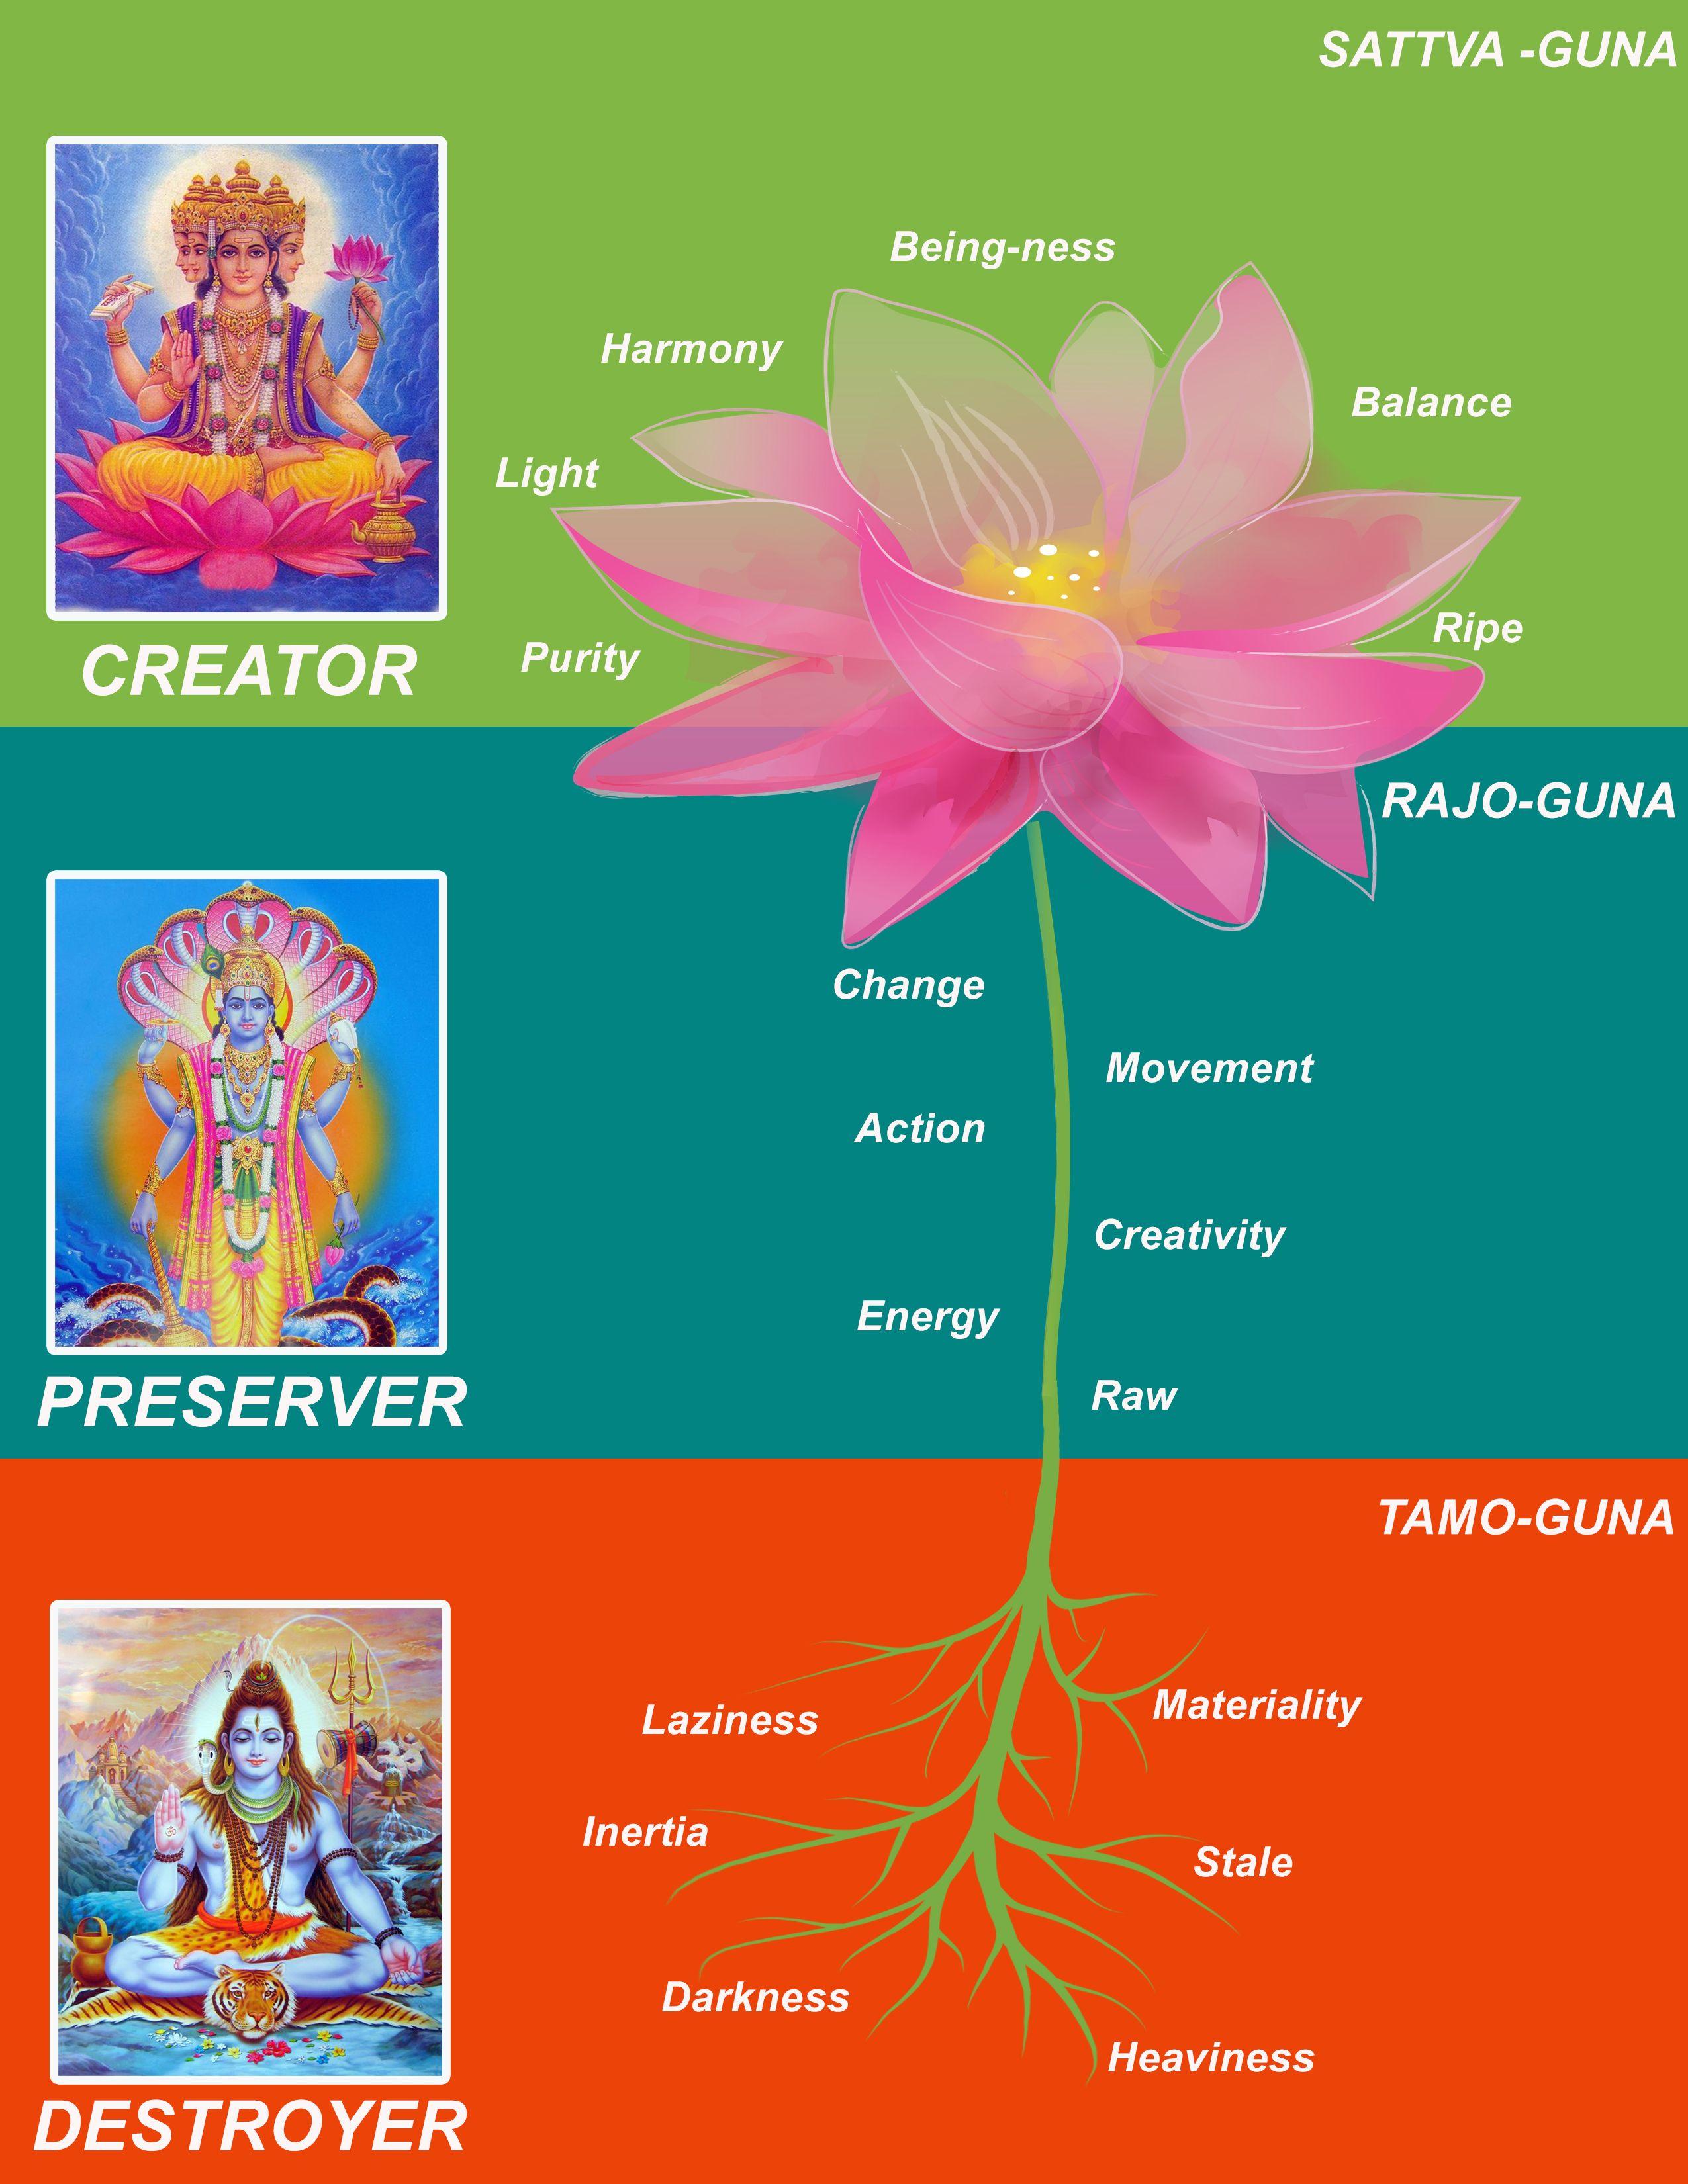 The Three Gunas Sattva Rajo And Tamo Sister Science Heal Your Mind Yoga Veda Ananda Yoga Ayurveda Yoga Yoga Sutras